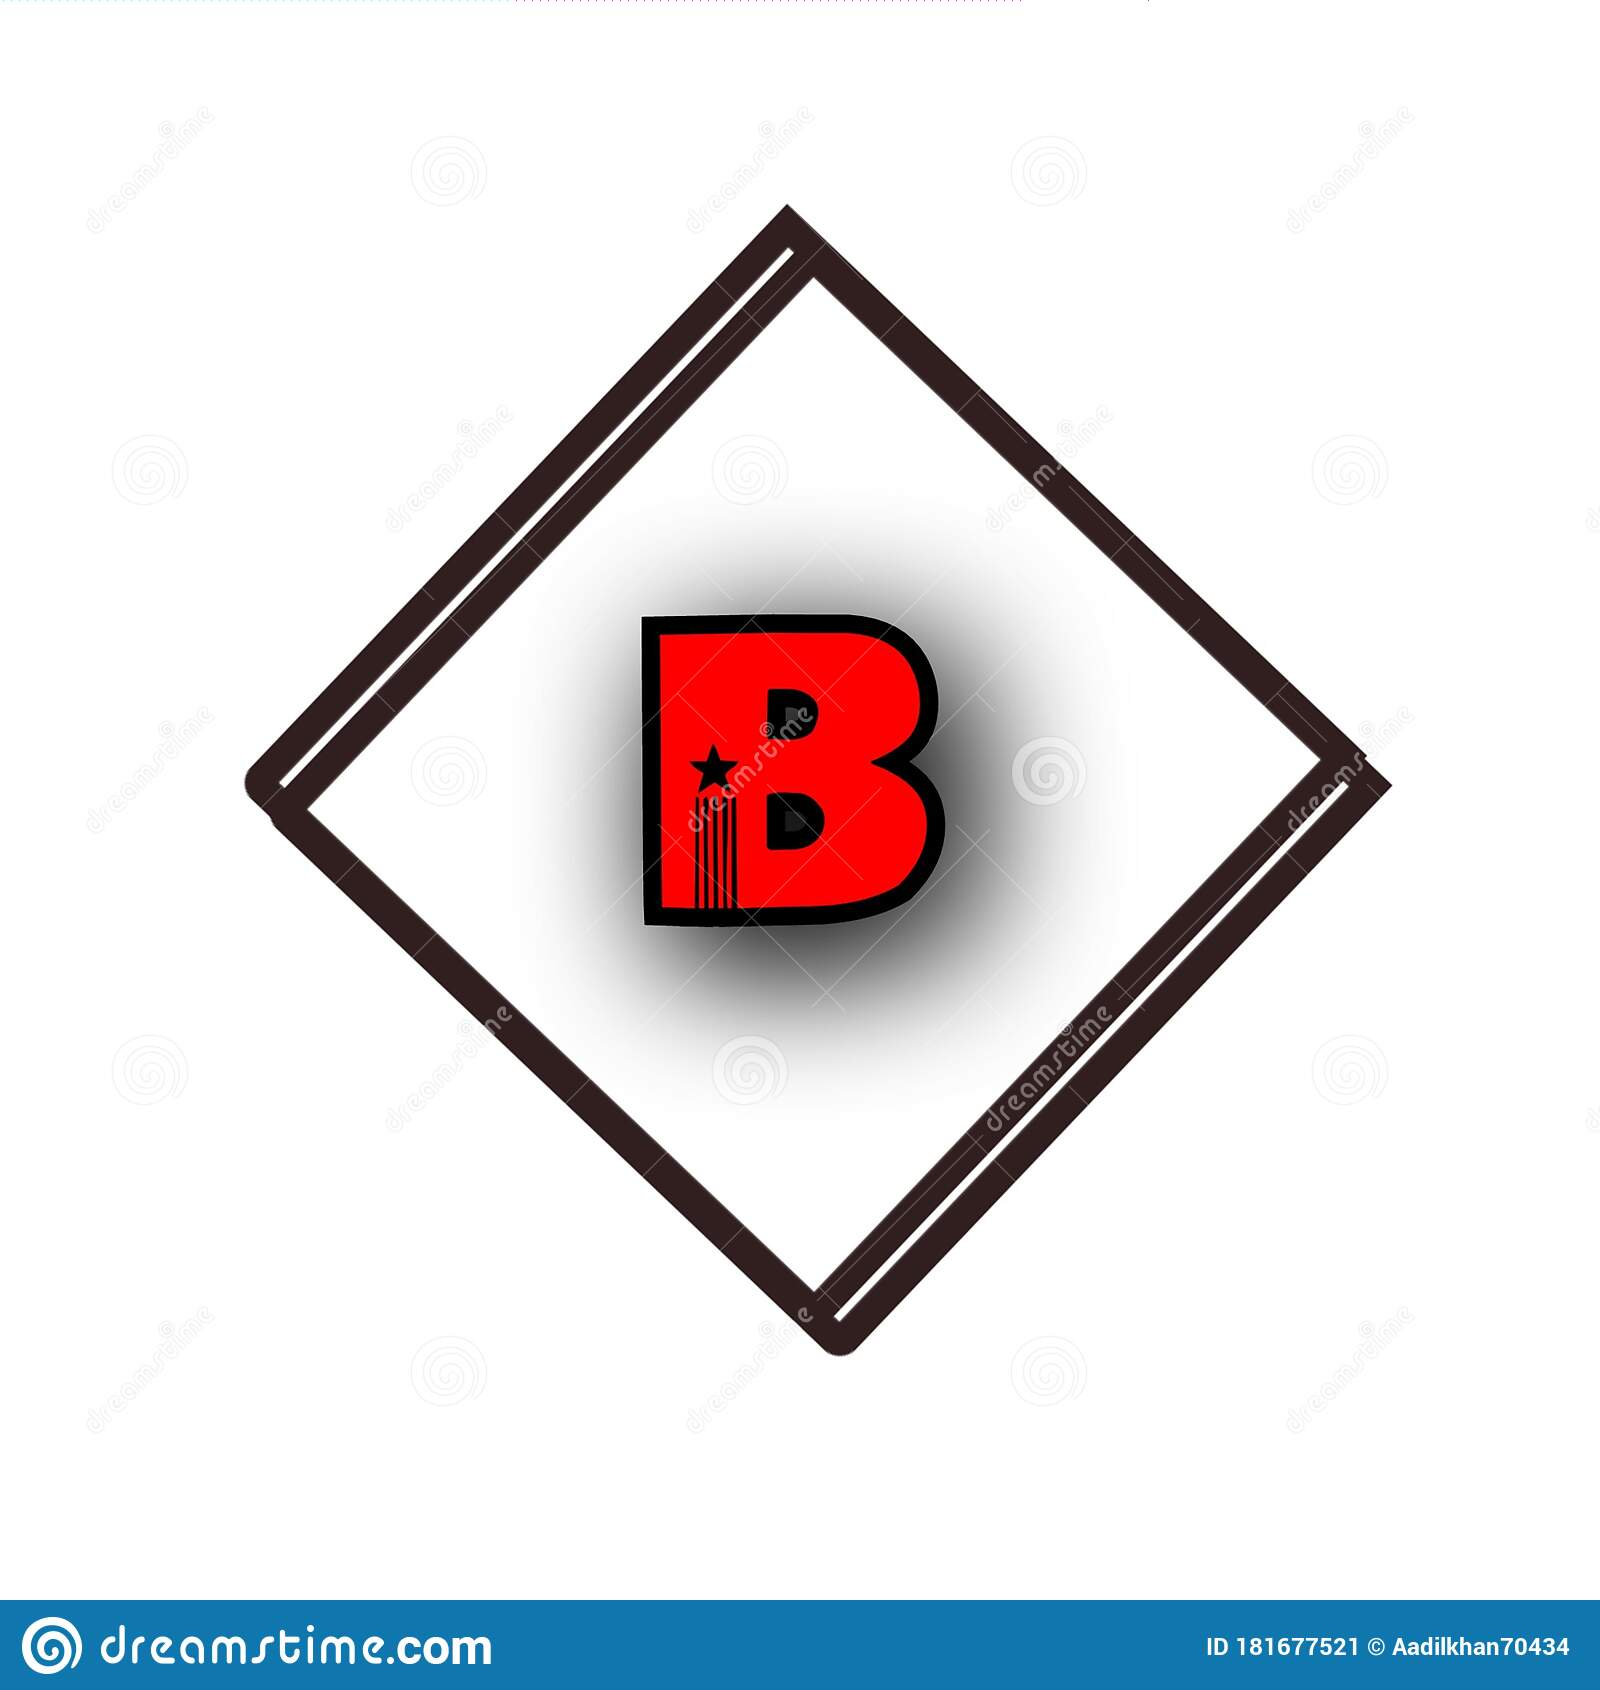 B Name Logo Wallpaper On Background ...